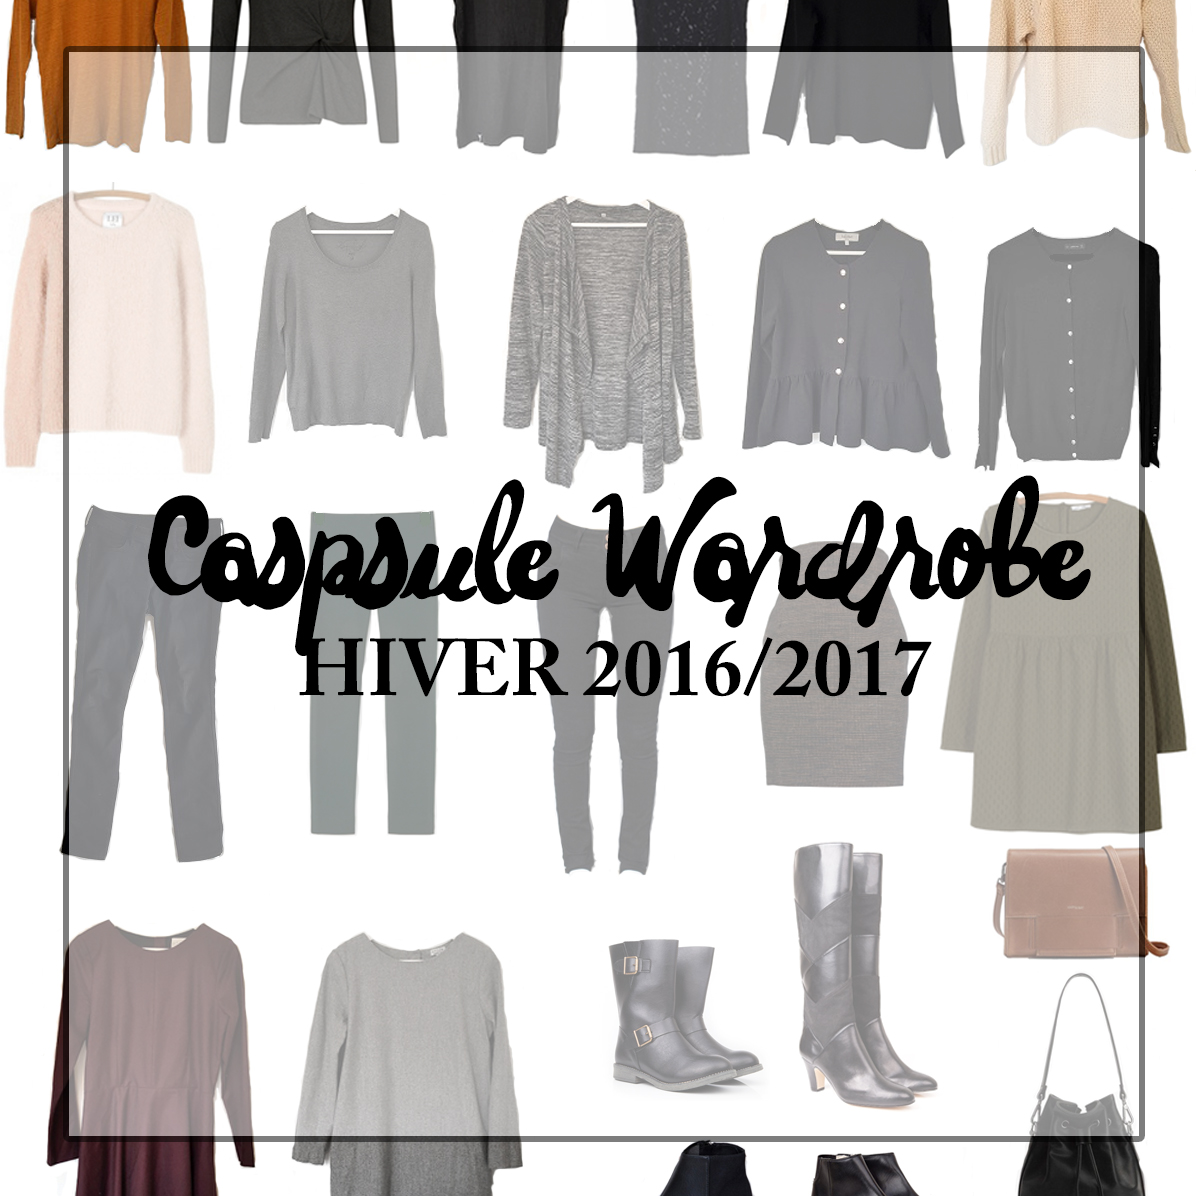 Capsule wardrobe hiver Minimalisme